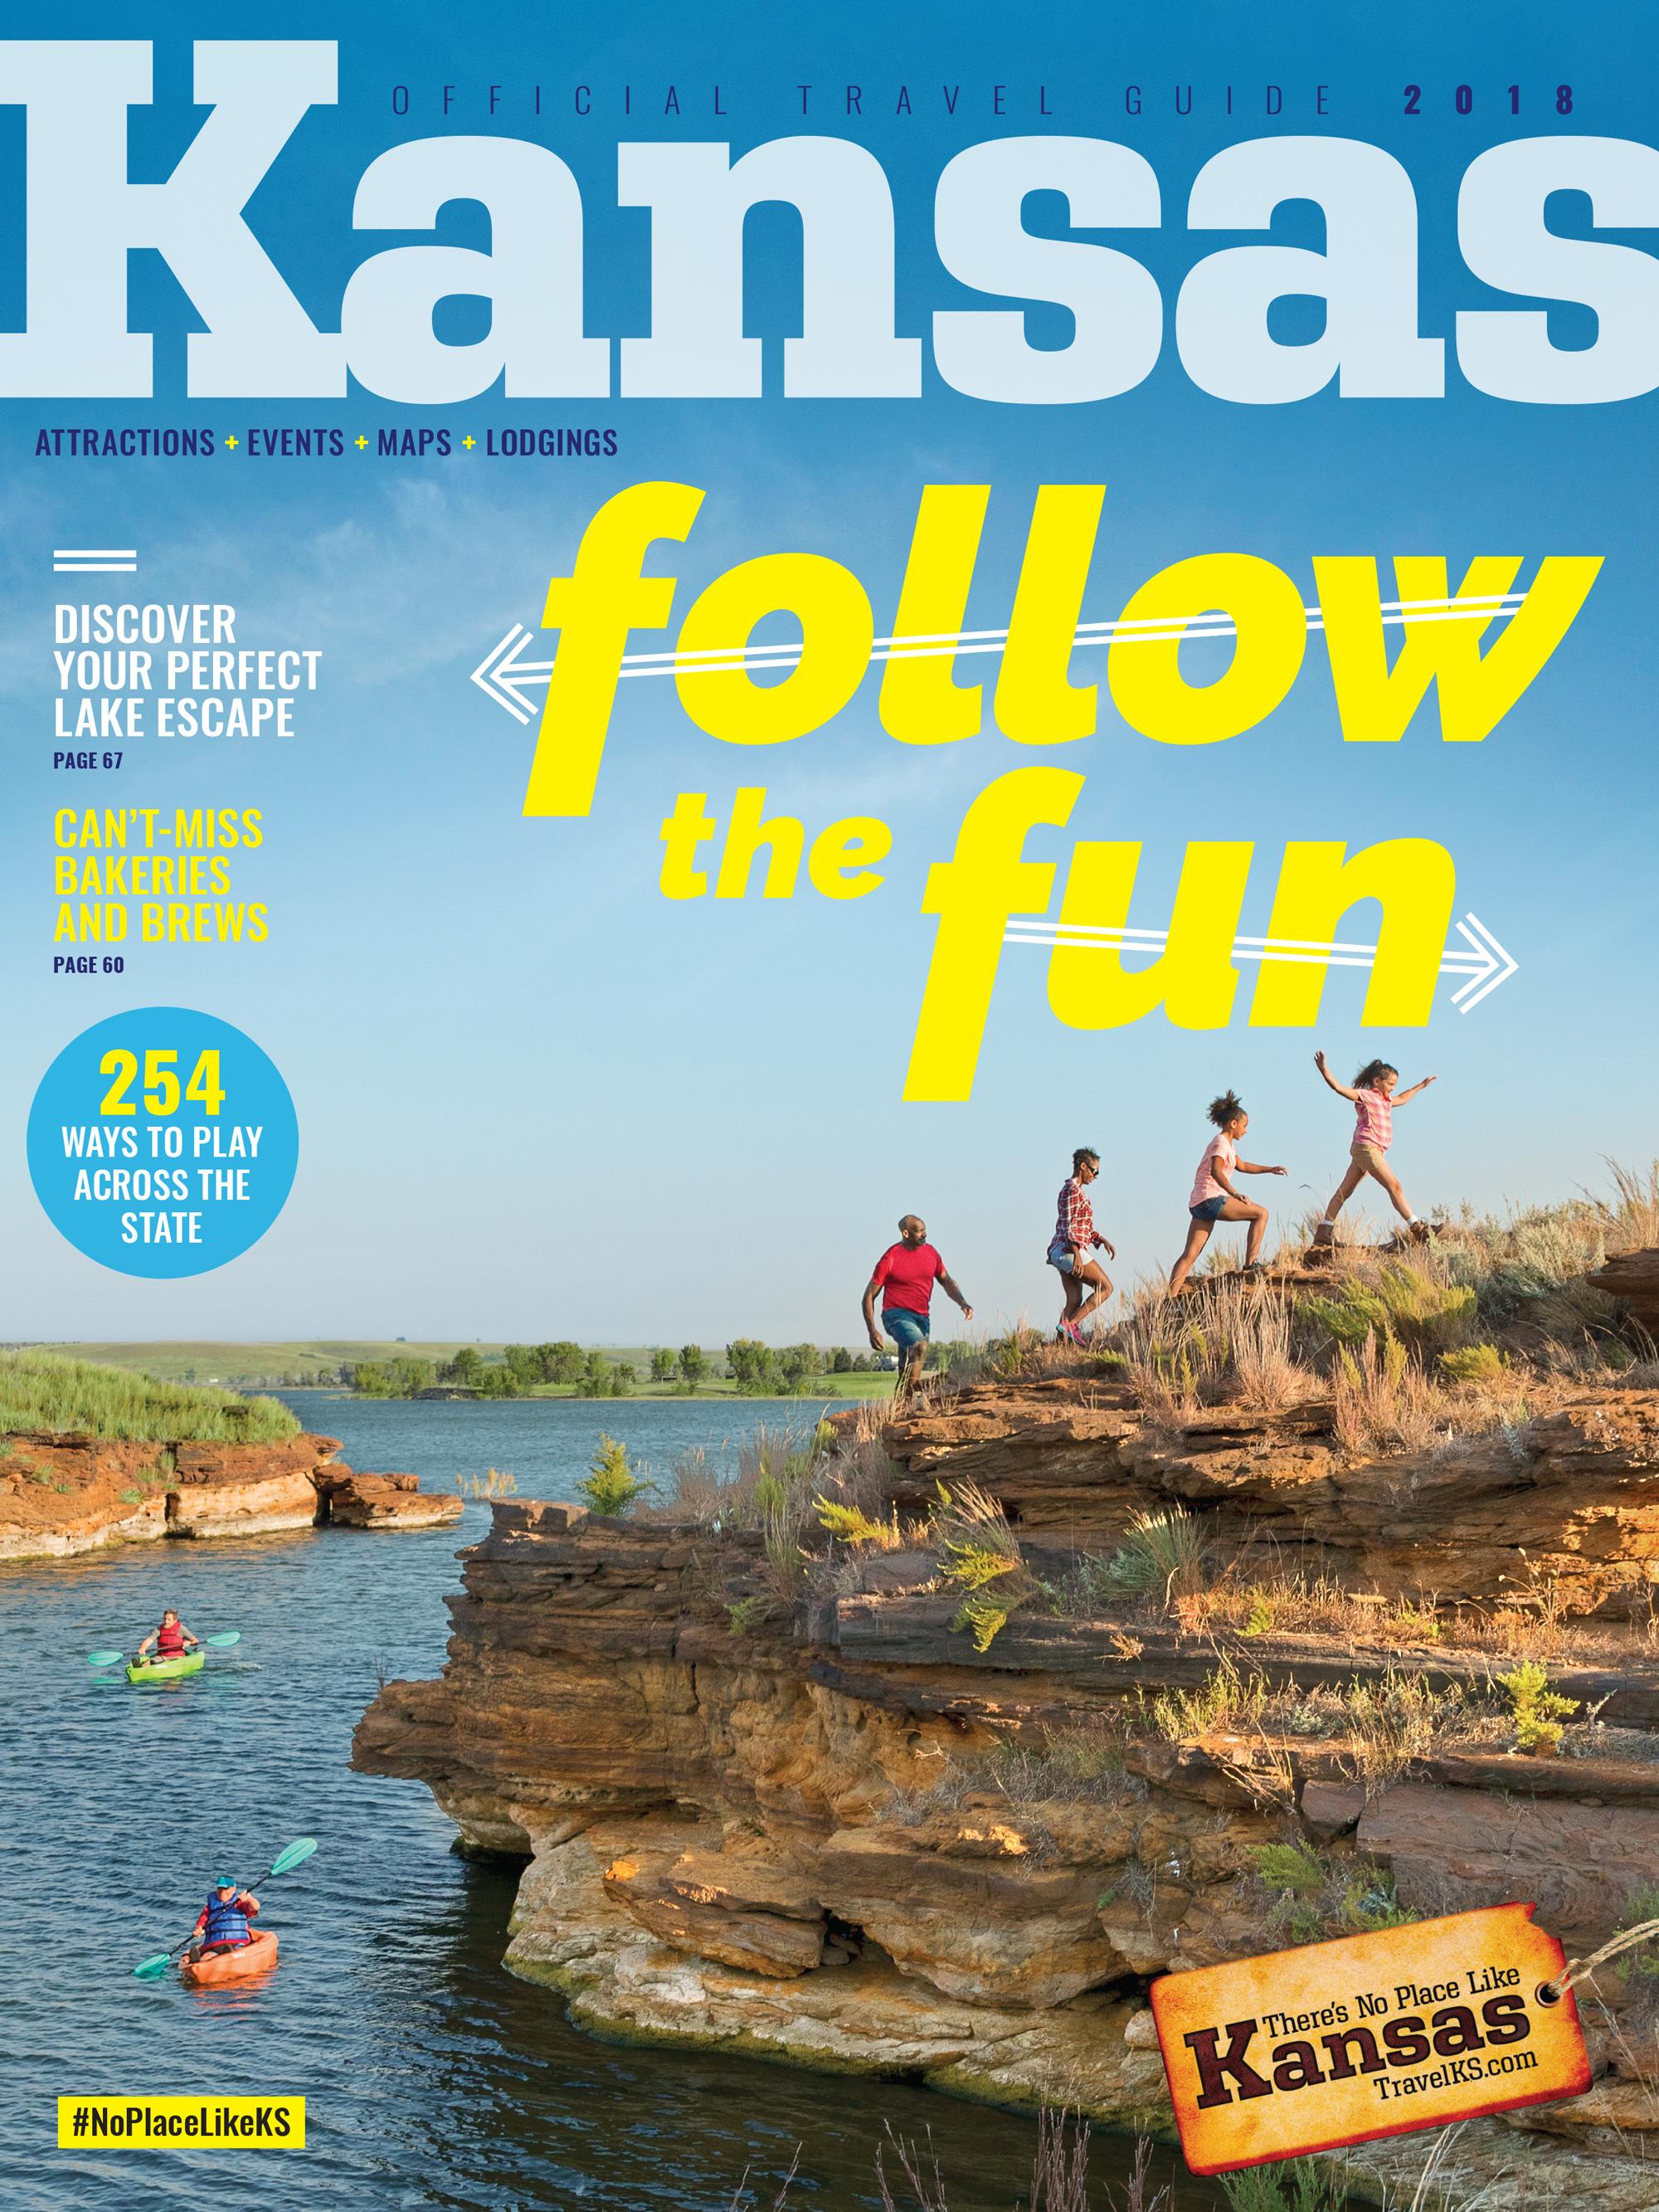 Kansas Travel Guide Cover